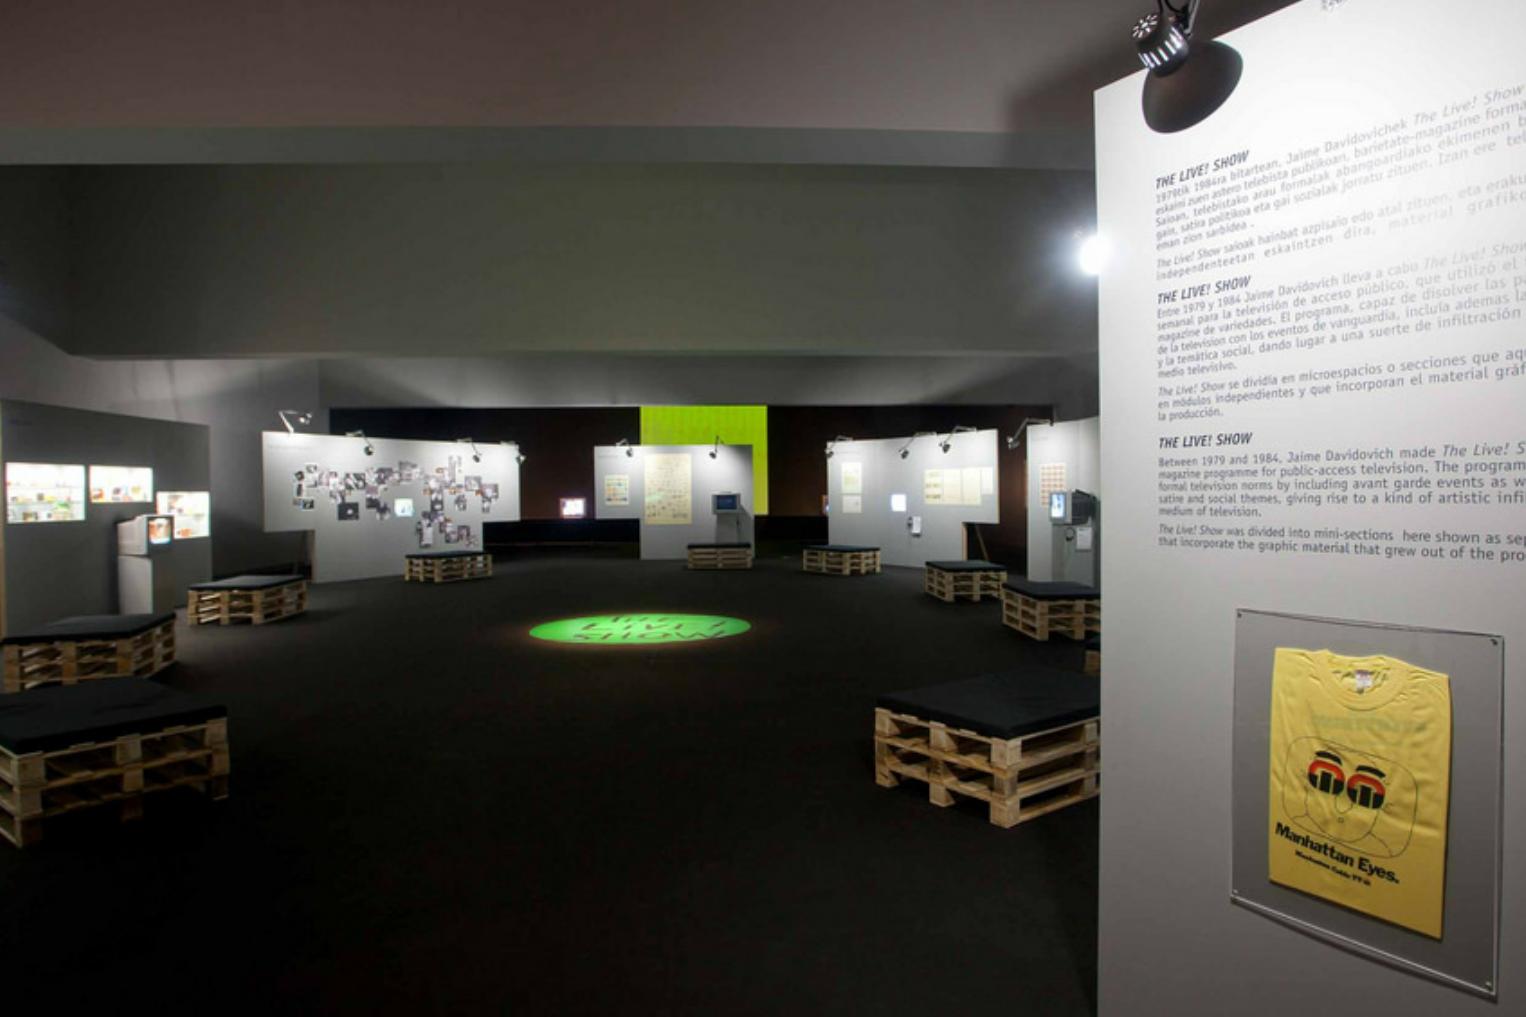 ATRIUM MUSEUM - Jaime Davidovich: Bite the Hand that Feeds YouOctober 2, 2010 - January 9, 2011Francia Kalea, 24, Vitoria-Gasteiz, Araba